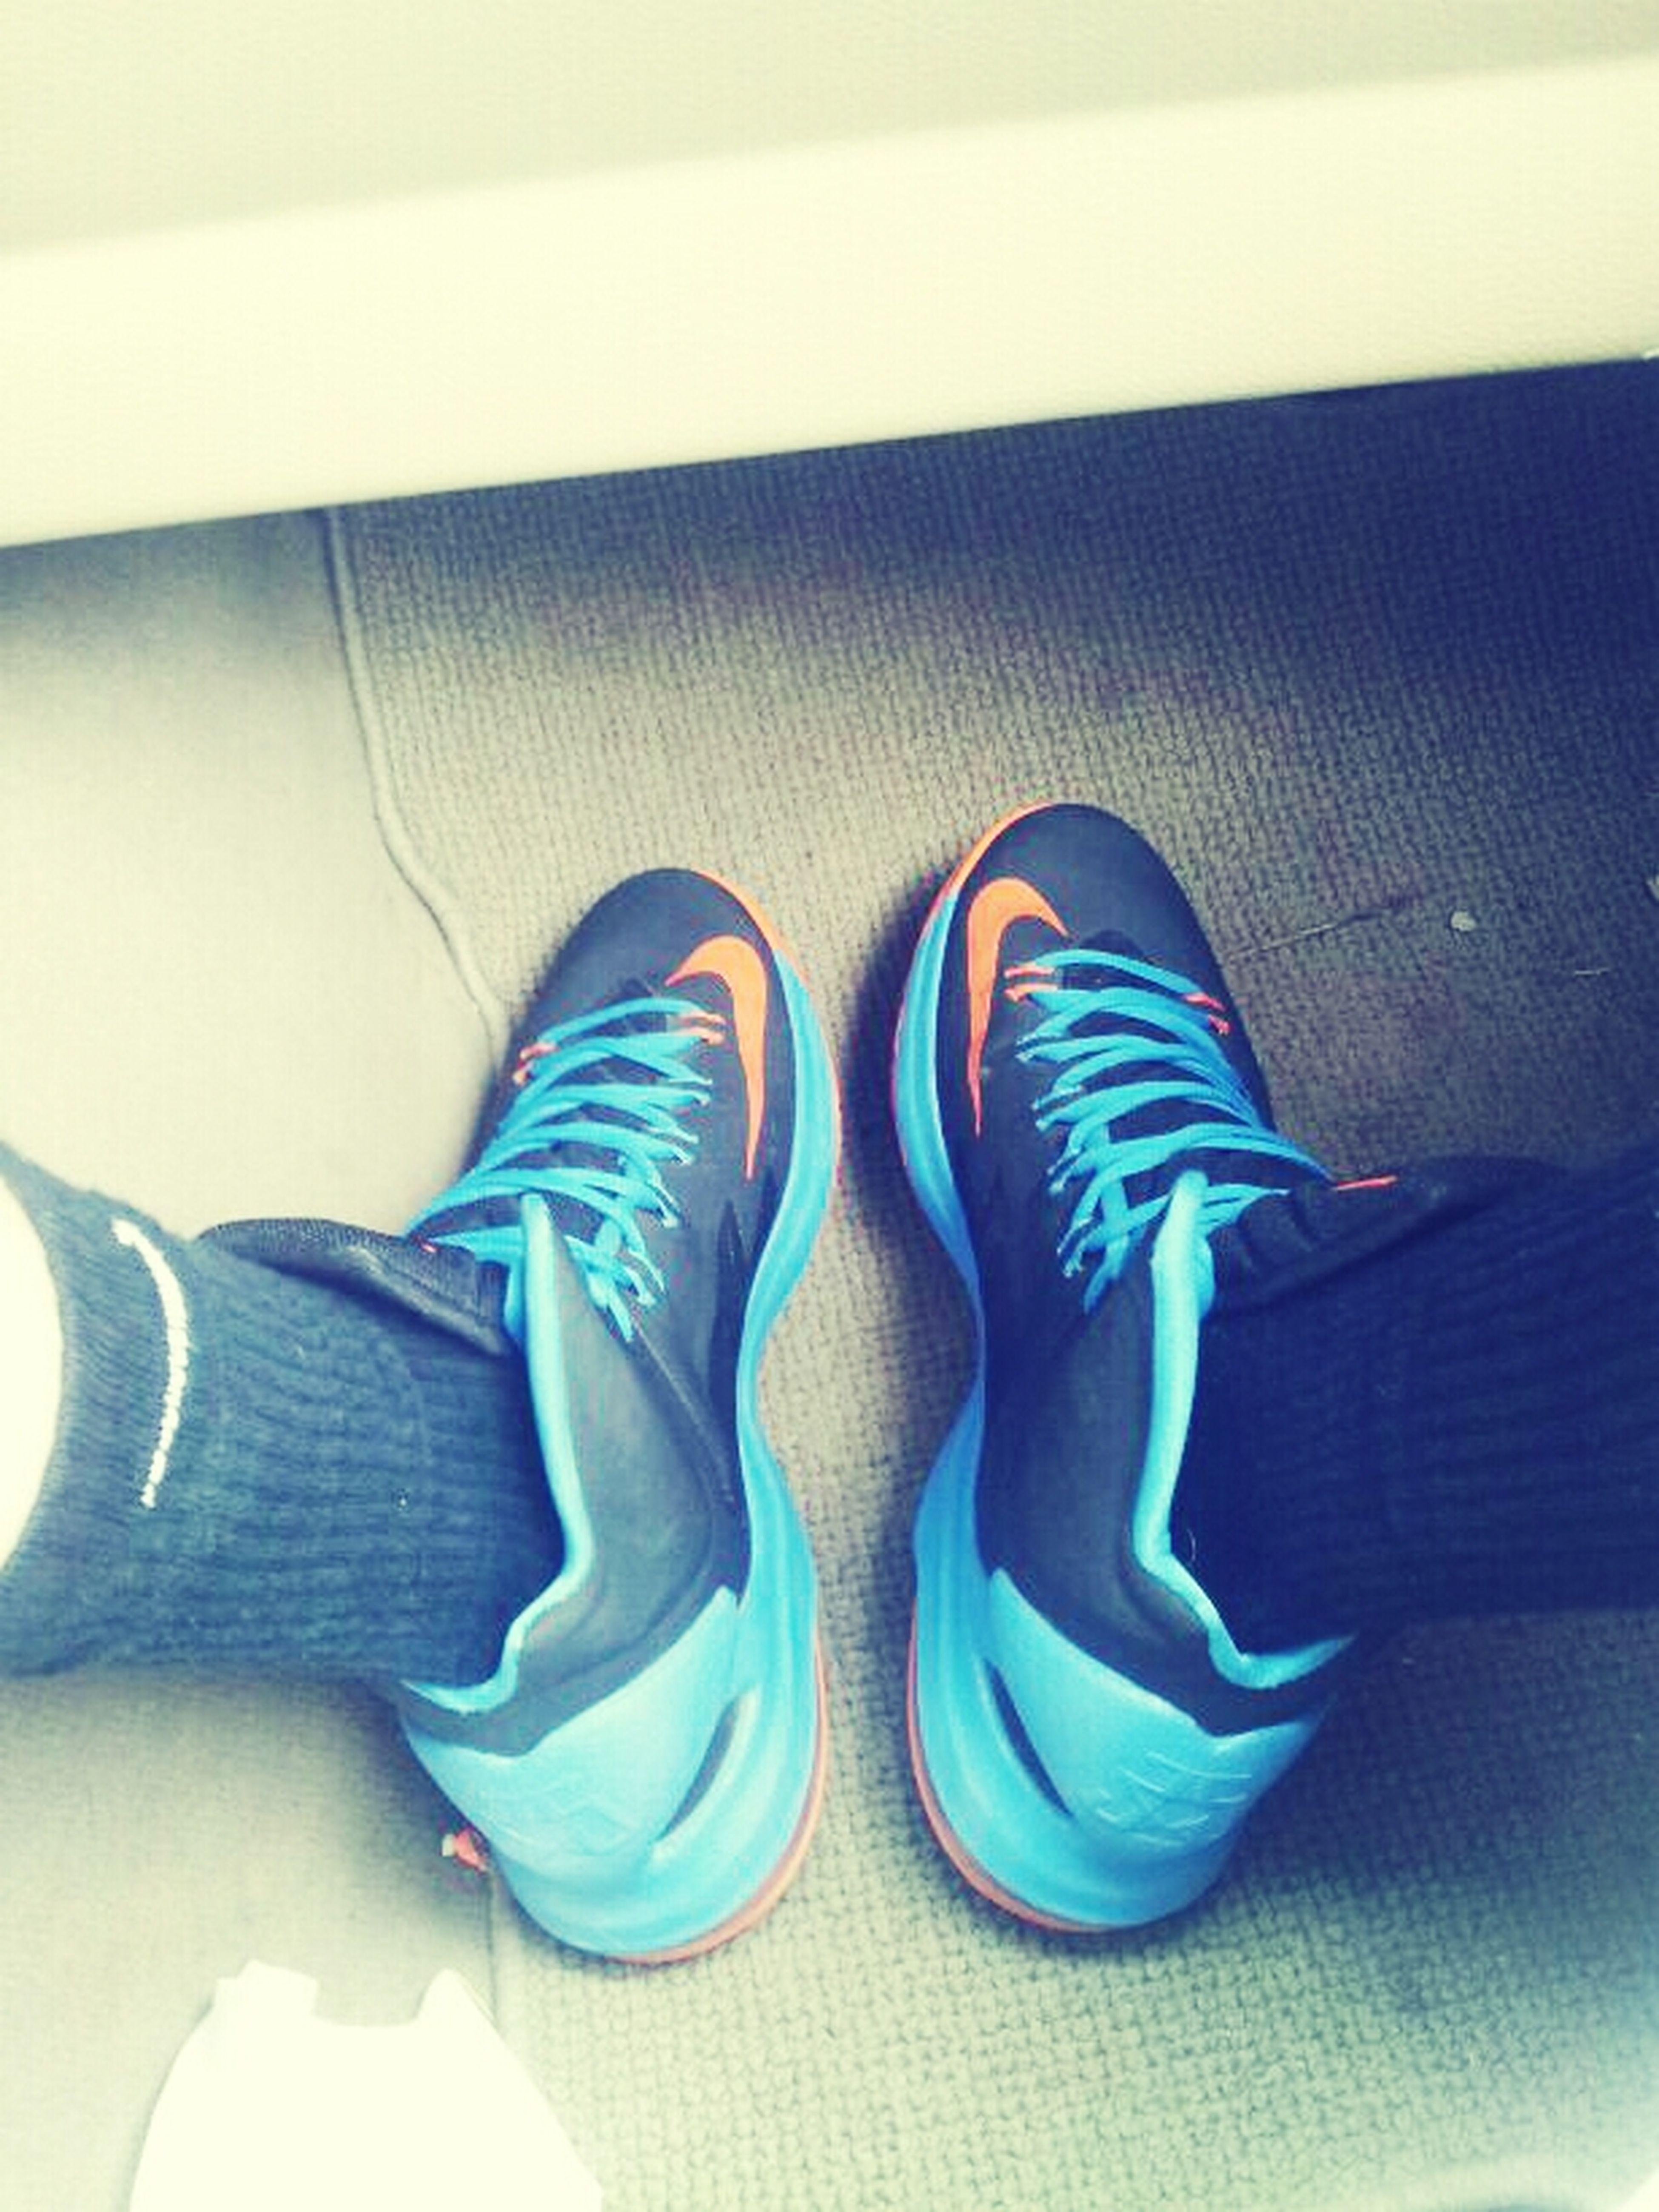 #kicksfortoday #KDVs